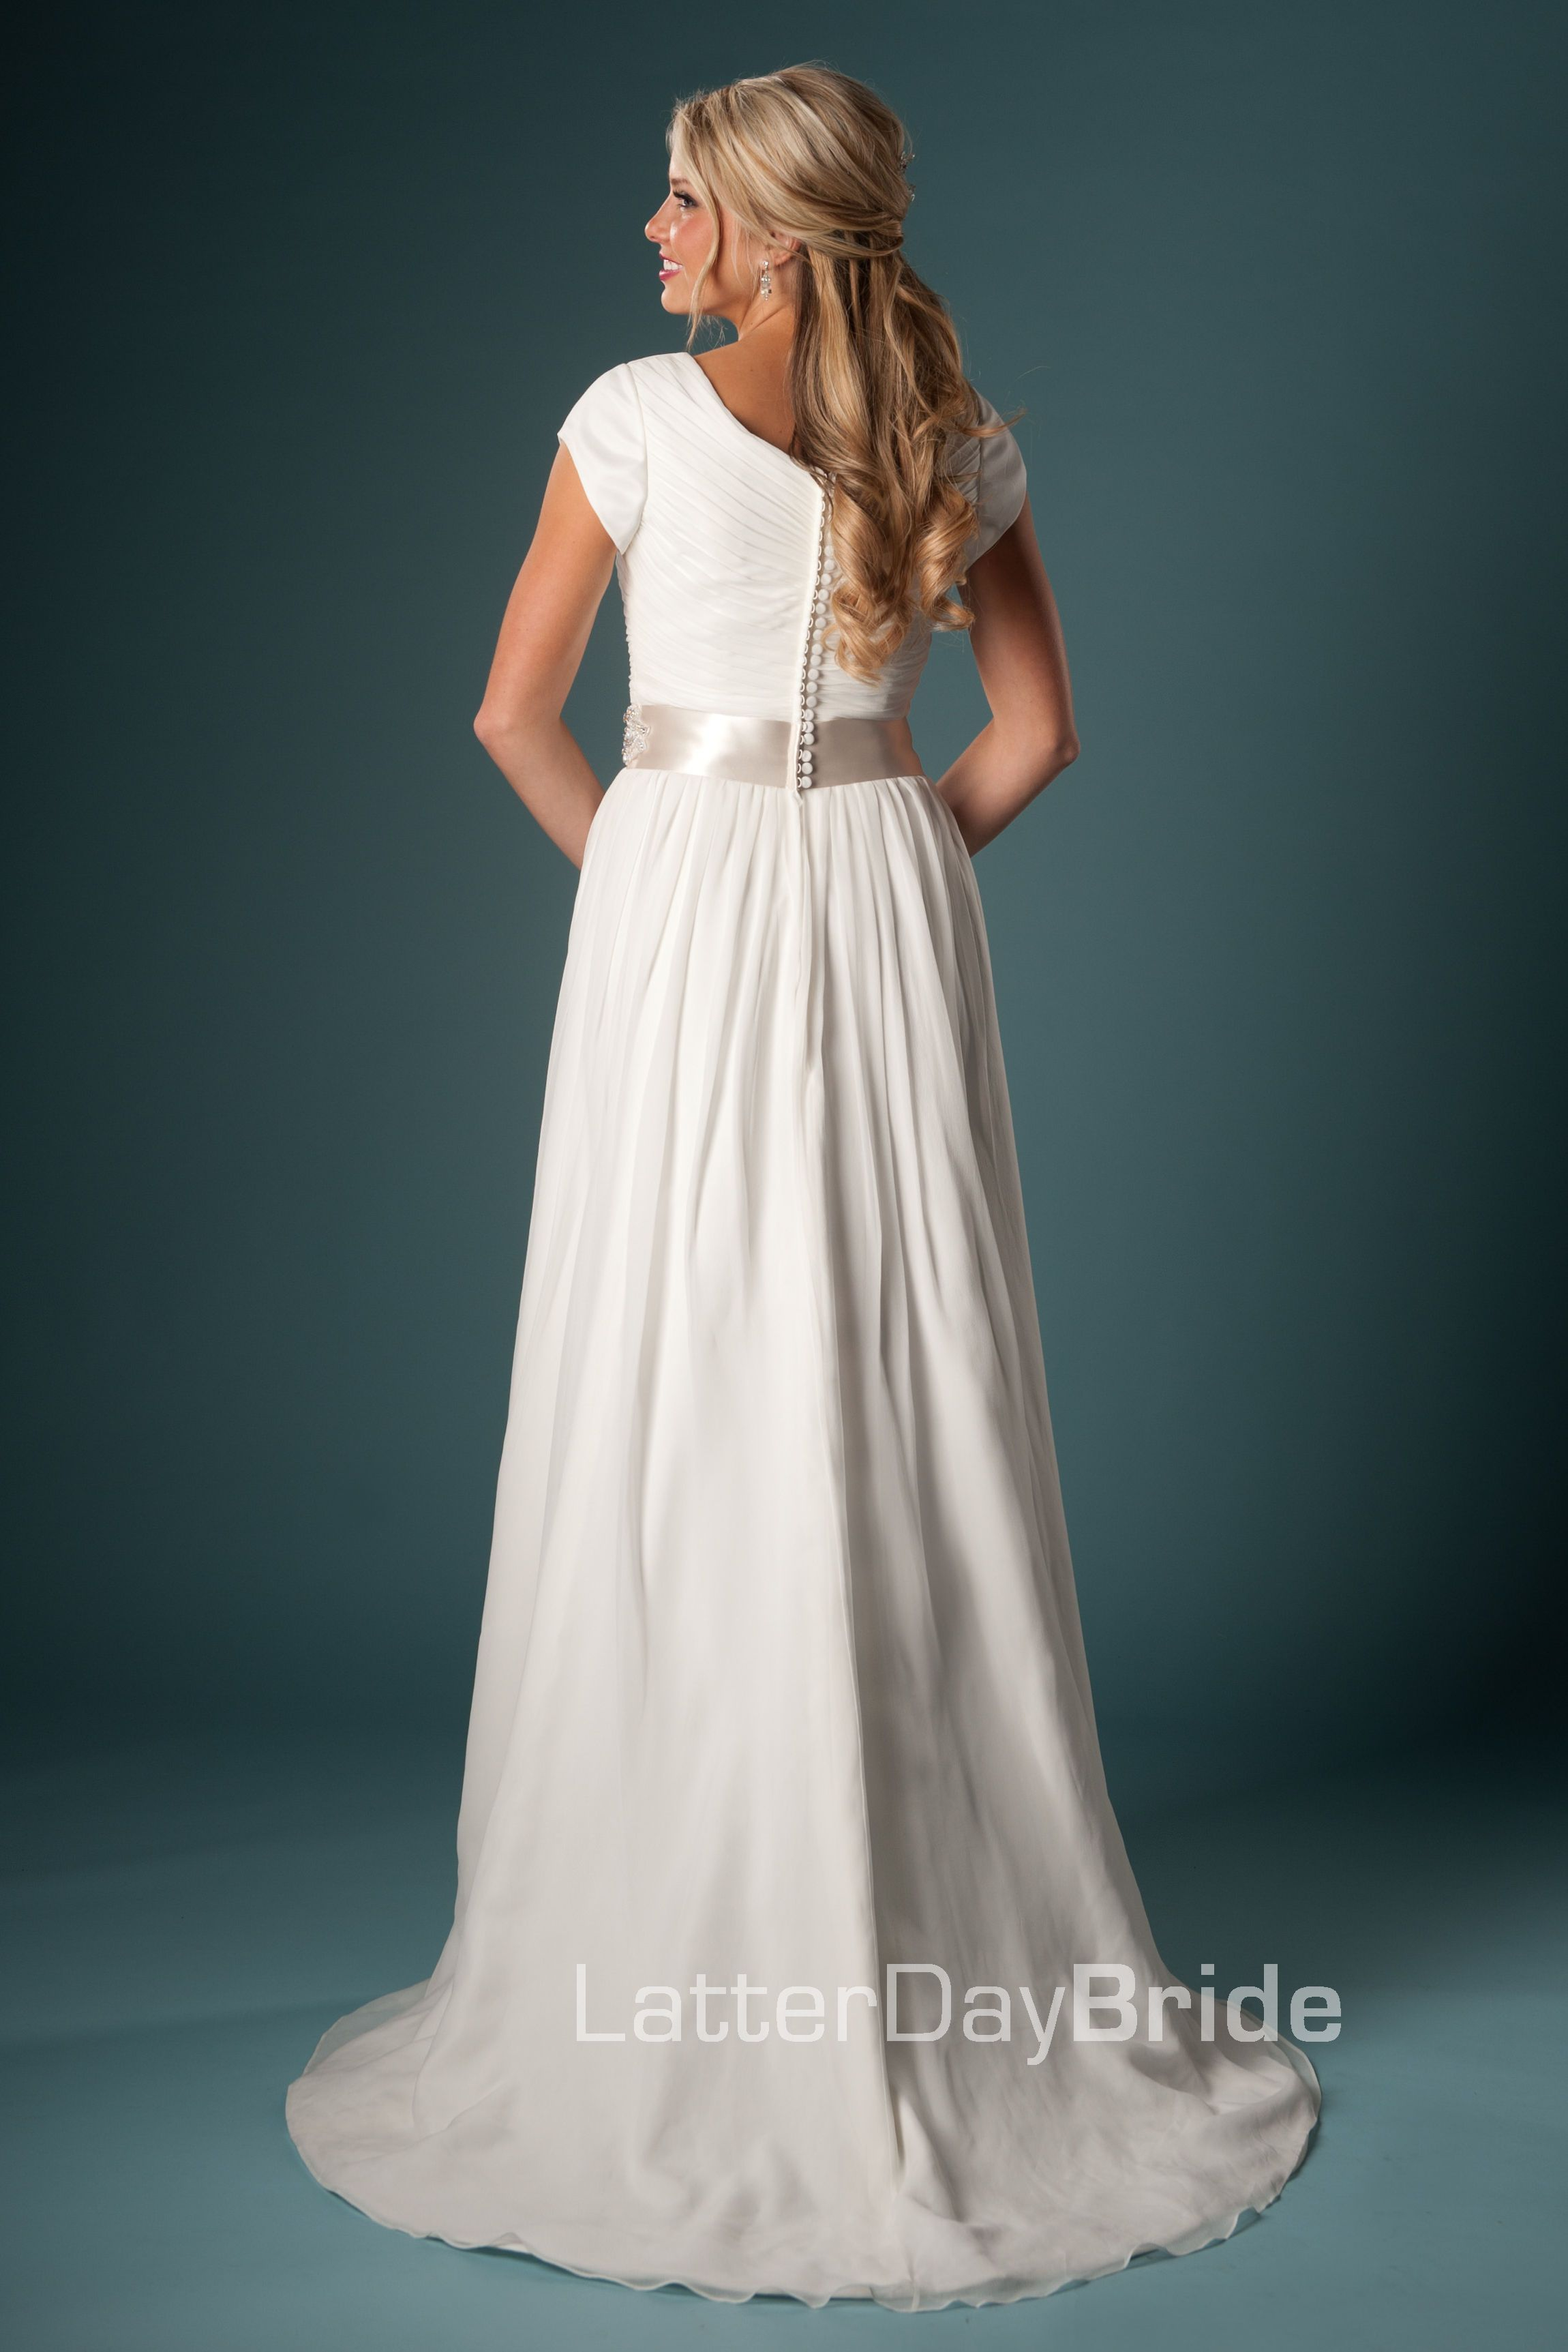 Modest Wedding Dress, Alvarito | LatterDayBride & Prom | Wedding ...